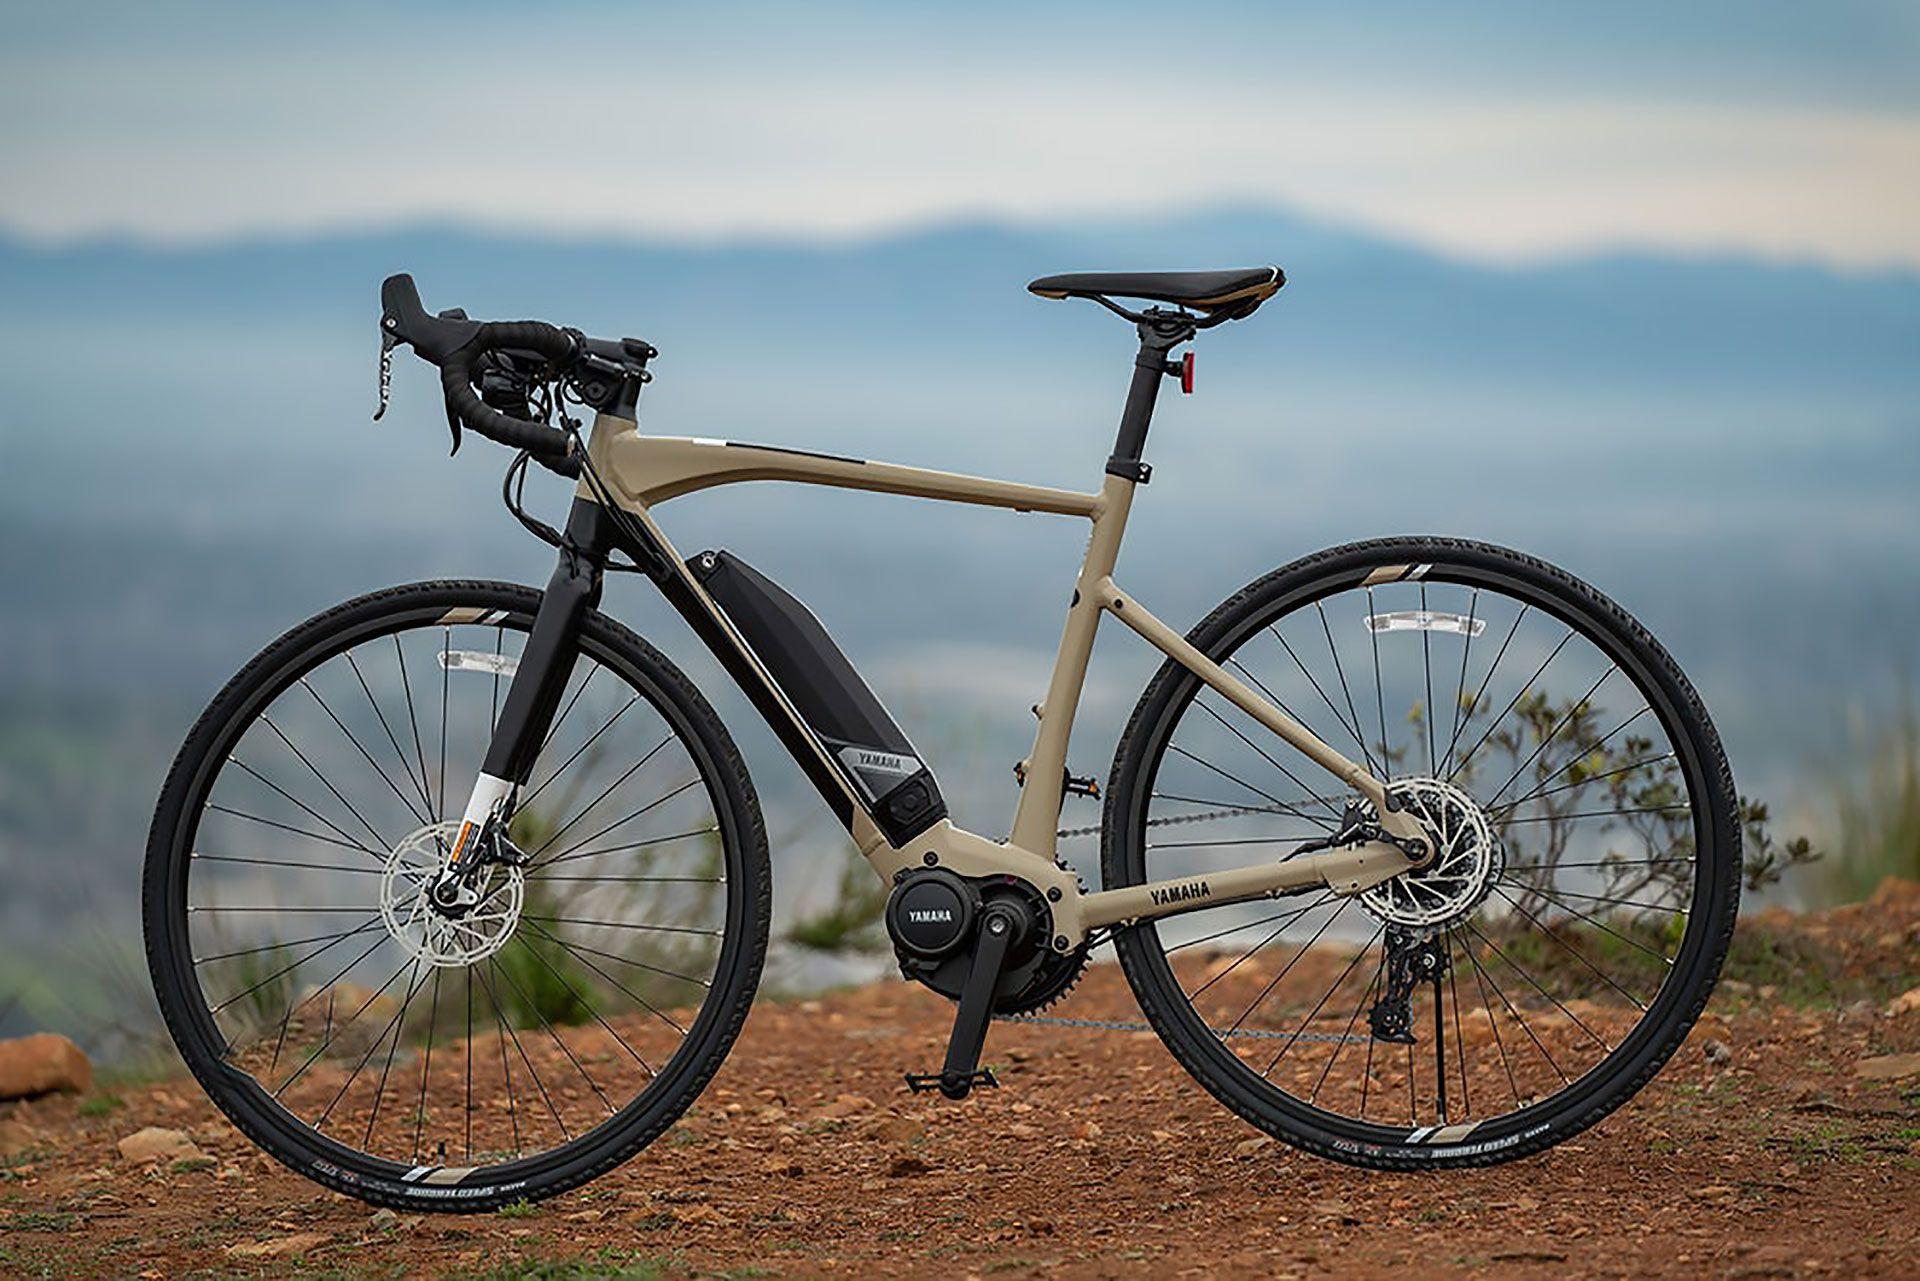 Yamaha Wabash Adventure Gravel E Bike Bisiklet Araba Seyahat